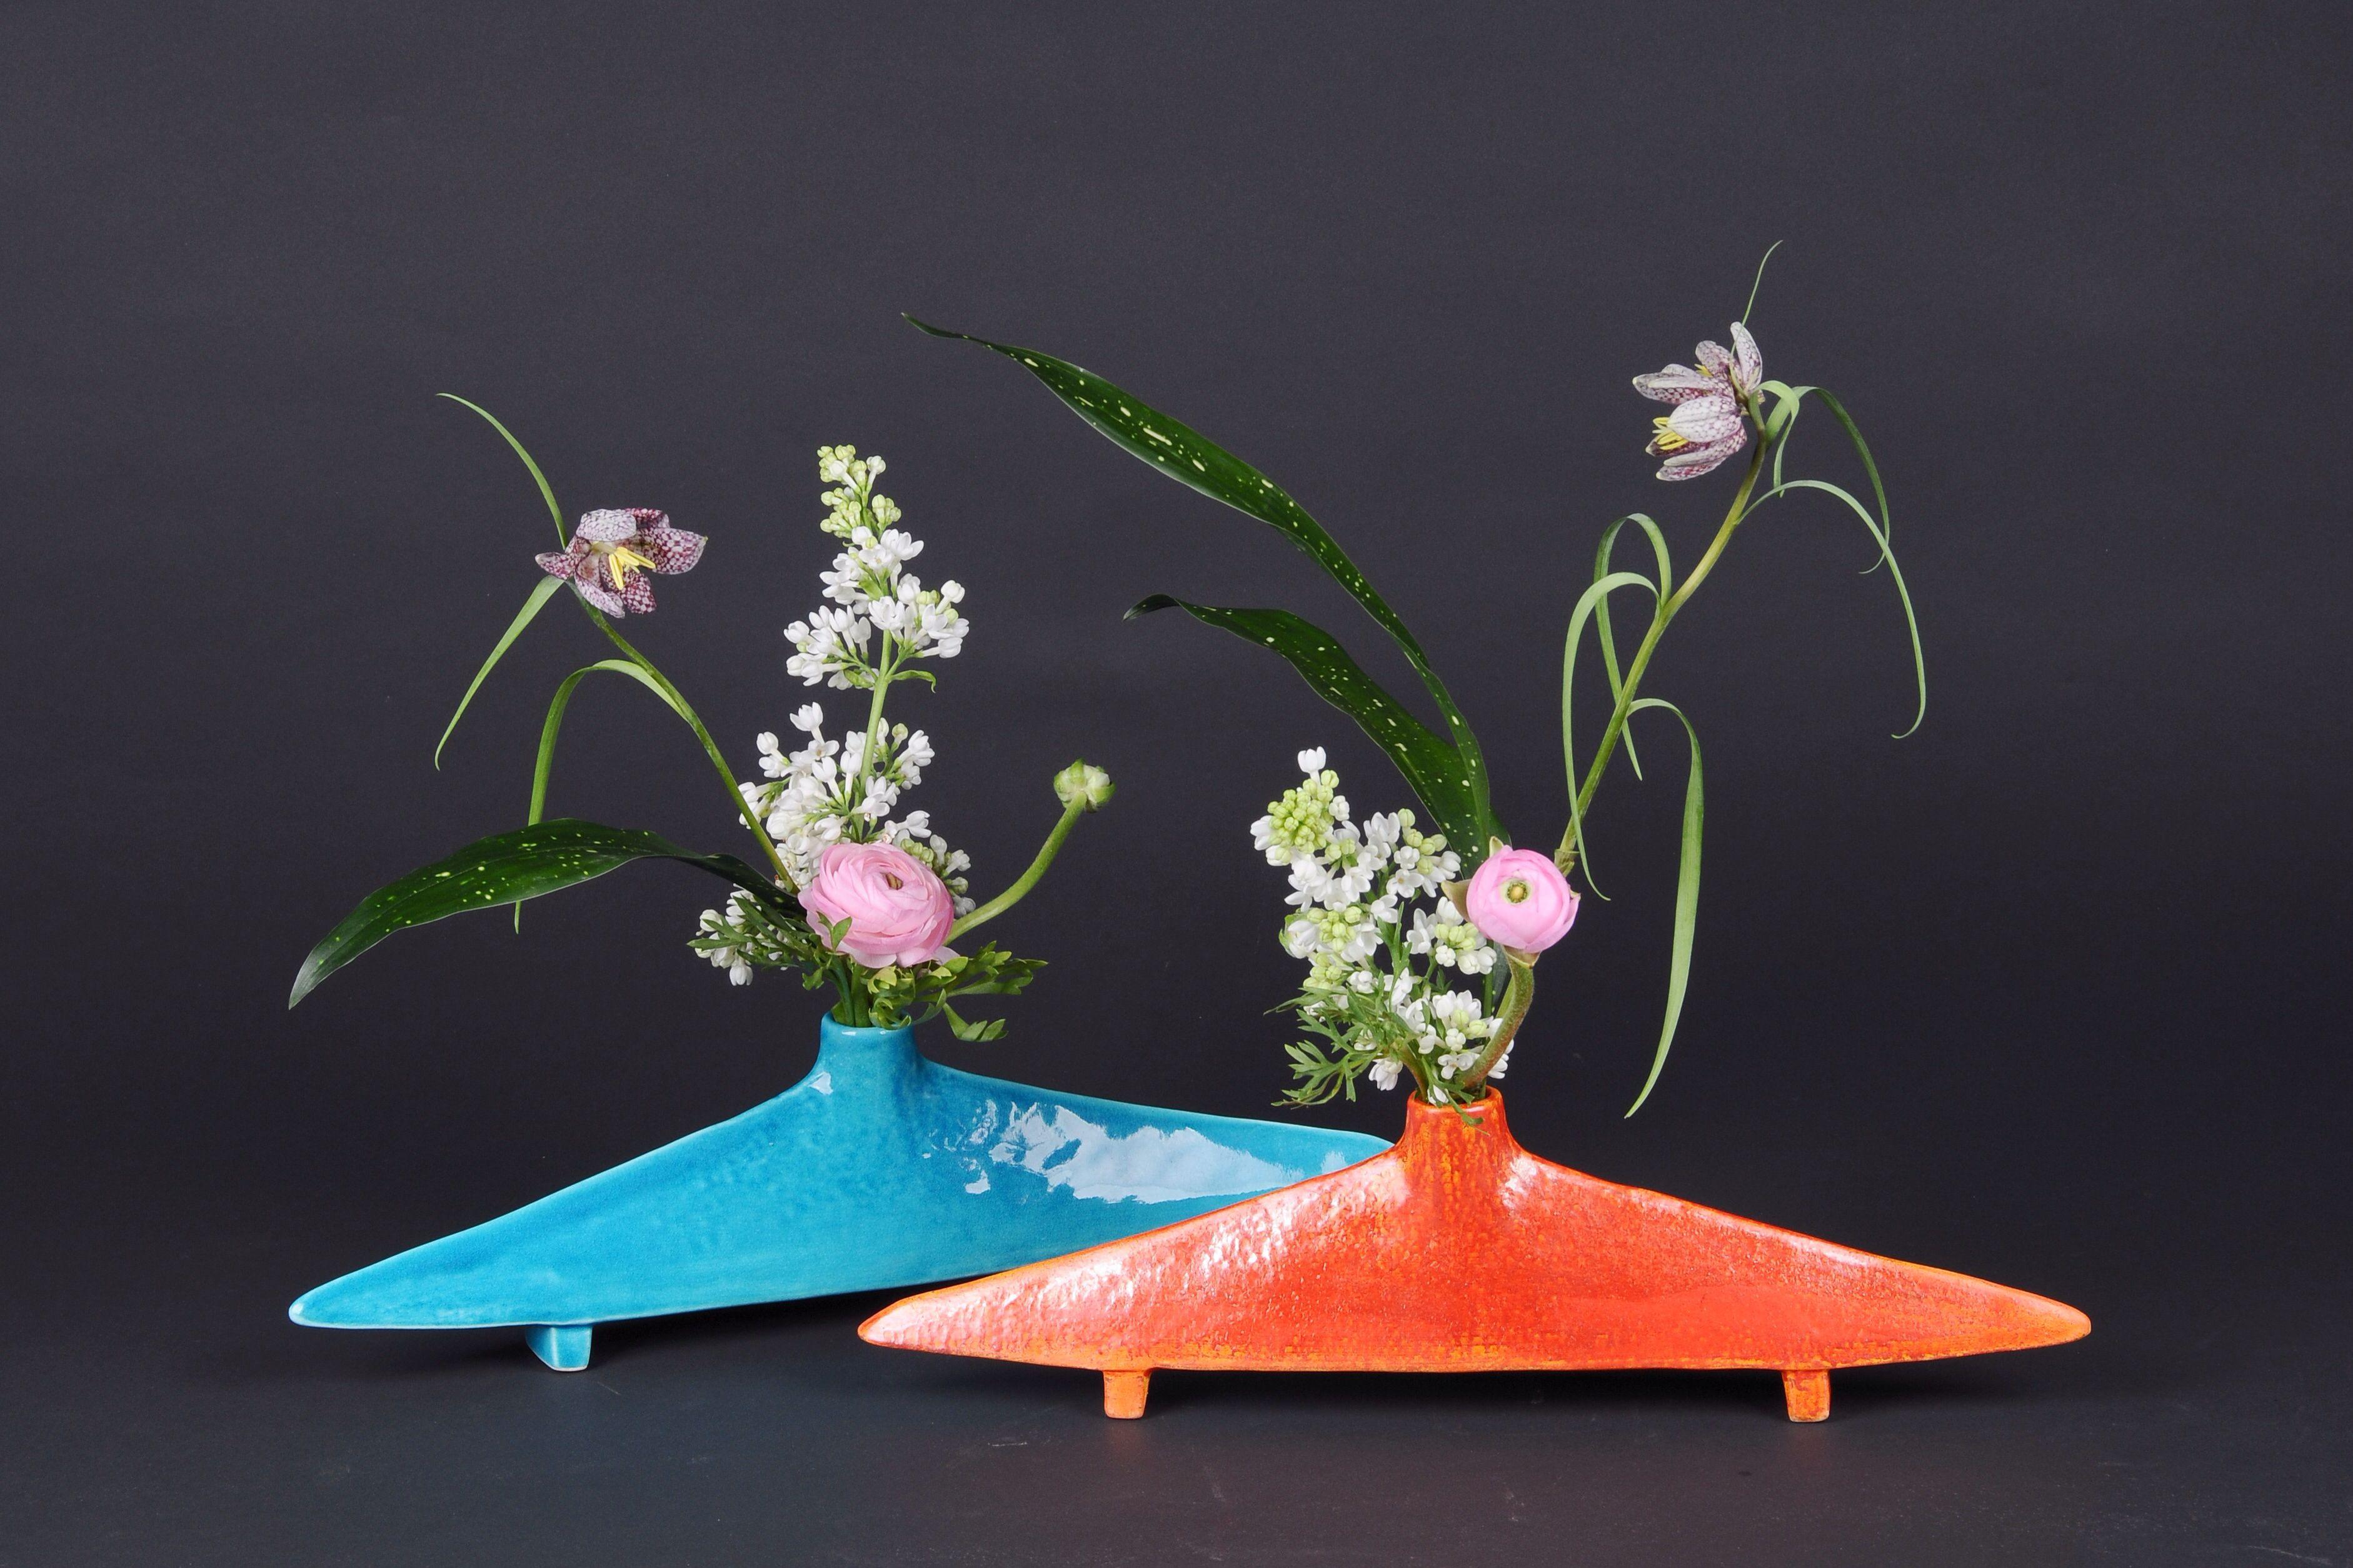 Ikebana ikenobo jiyuka japan flower arrangement by